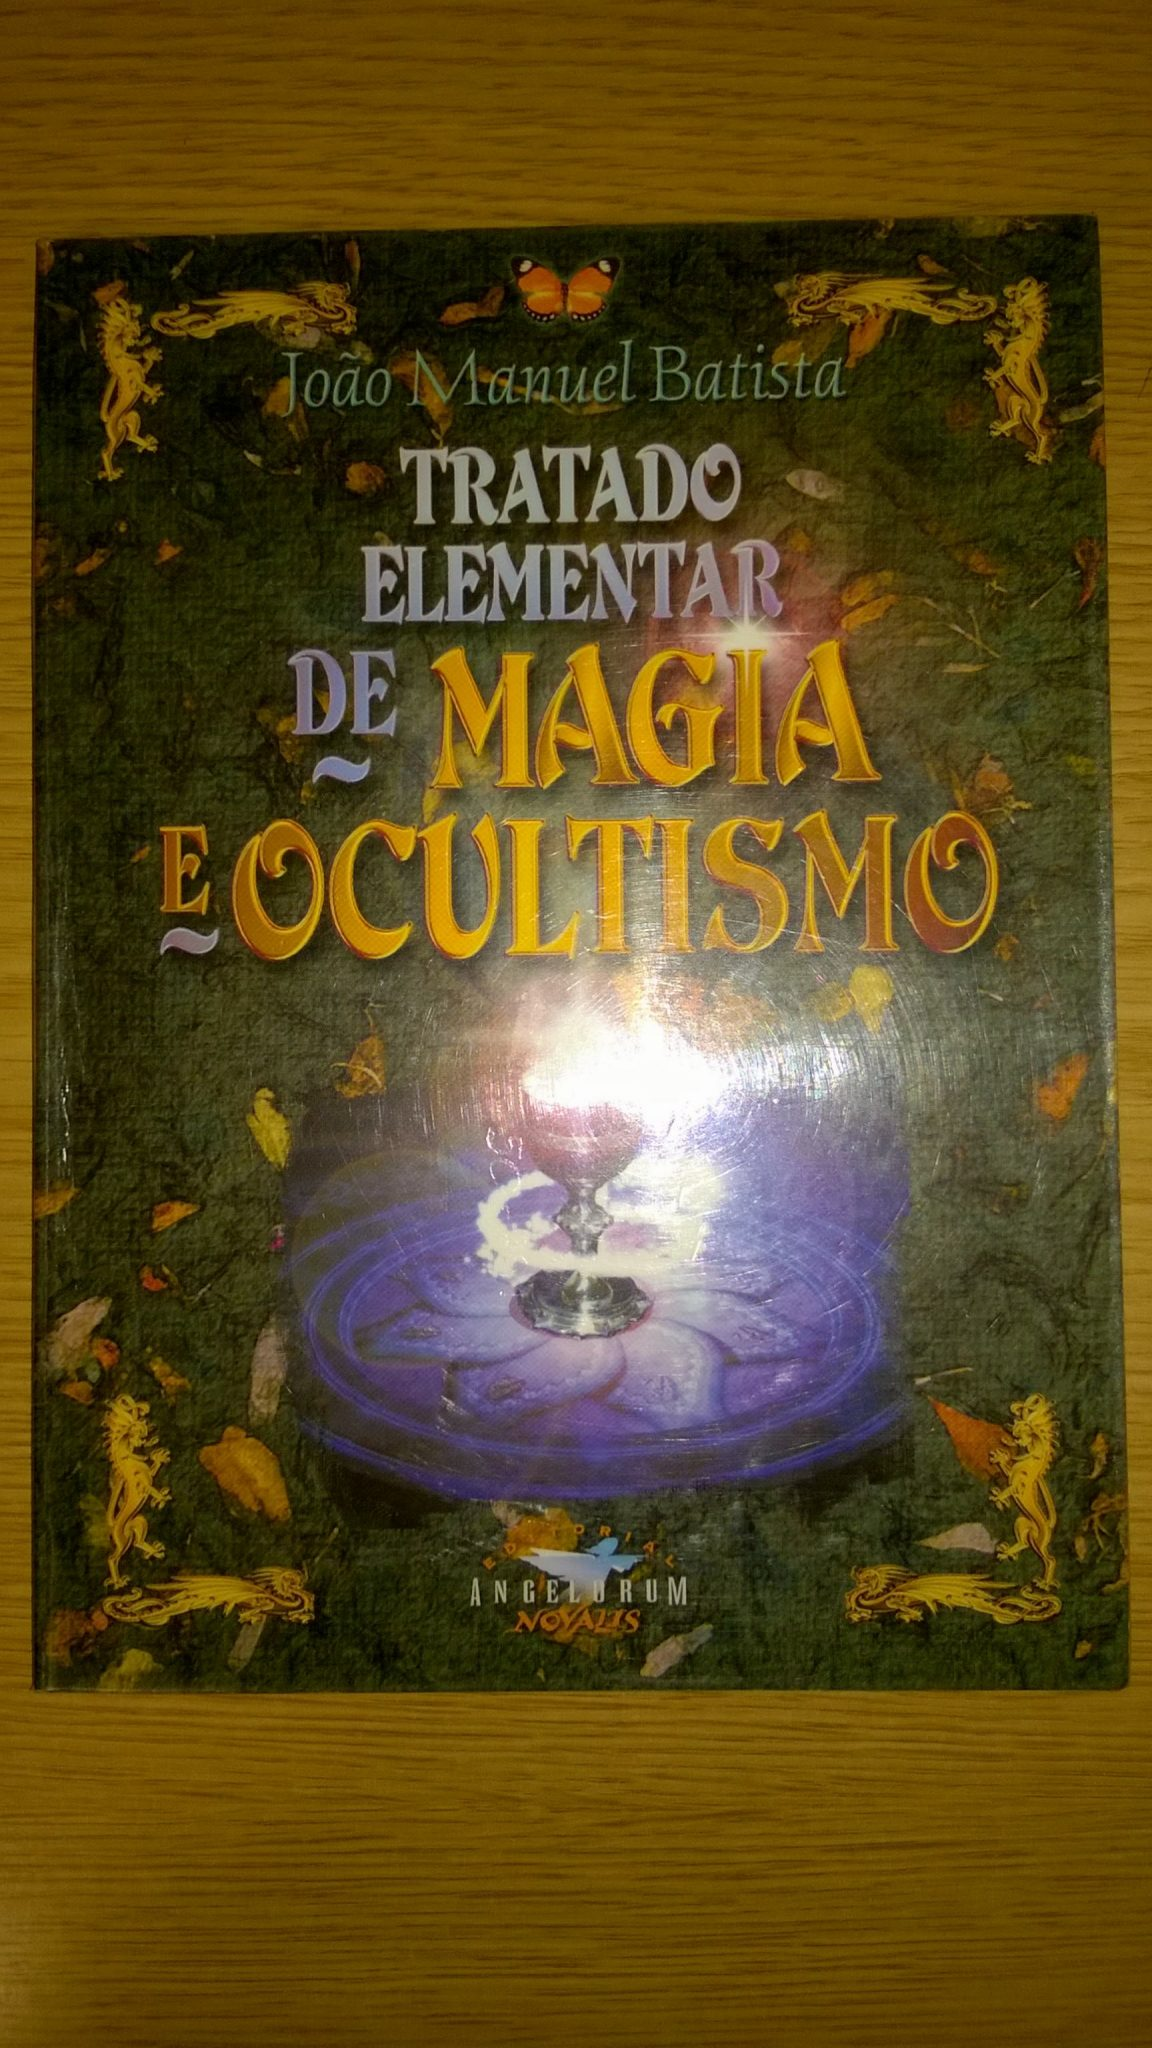 Tratado Elementar de Magia e Ocultismo